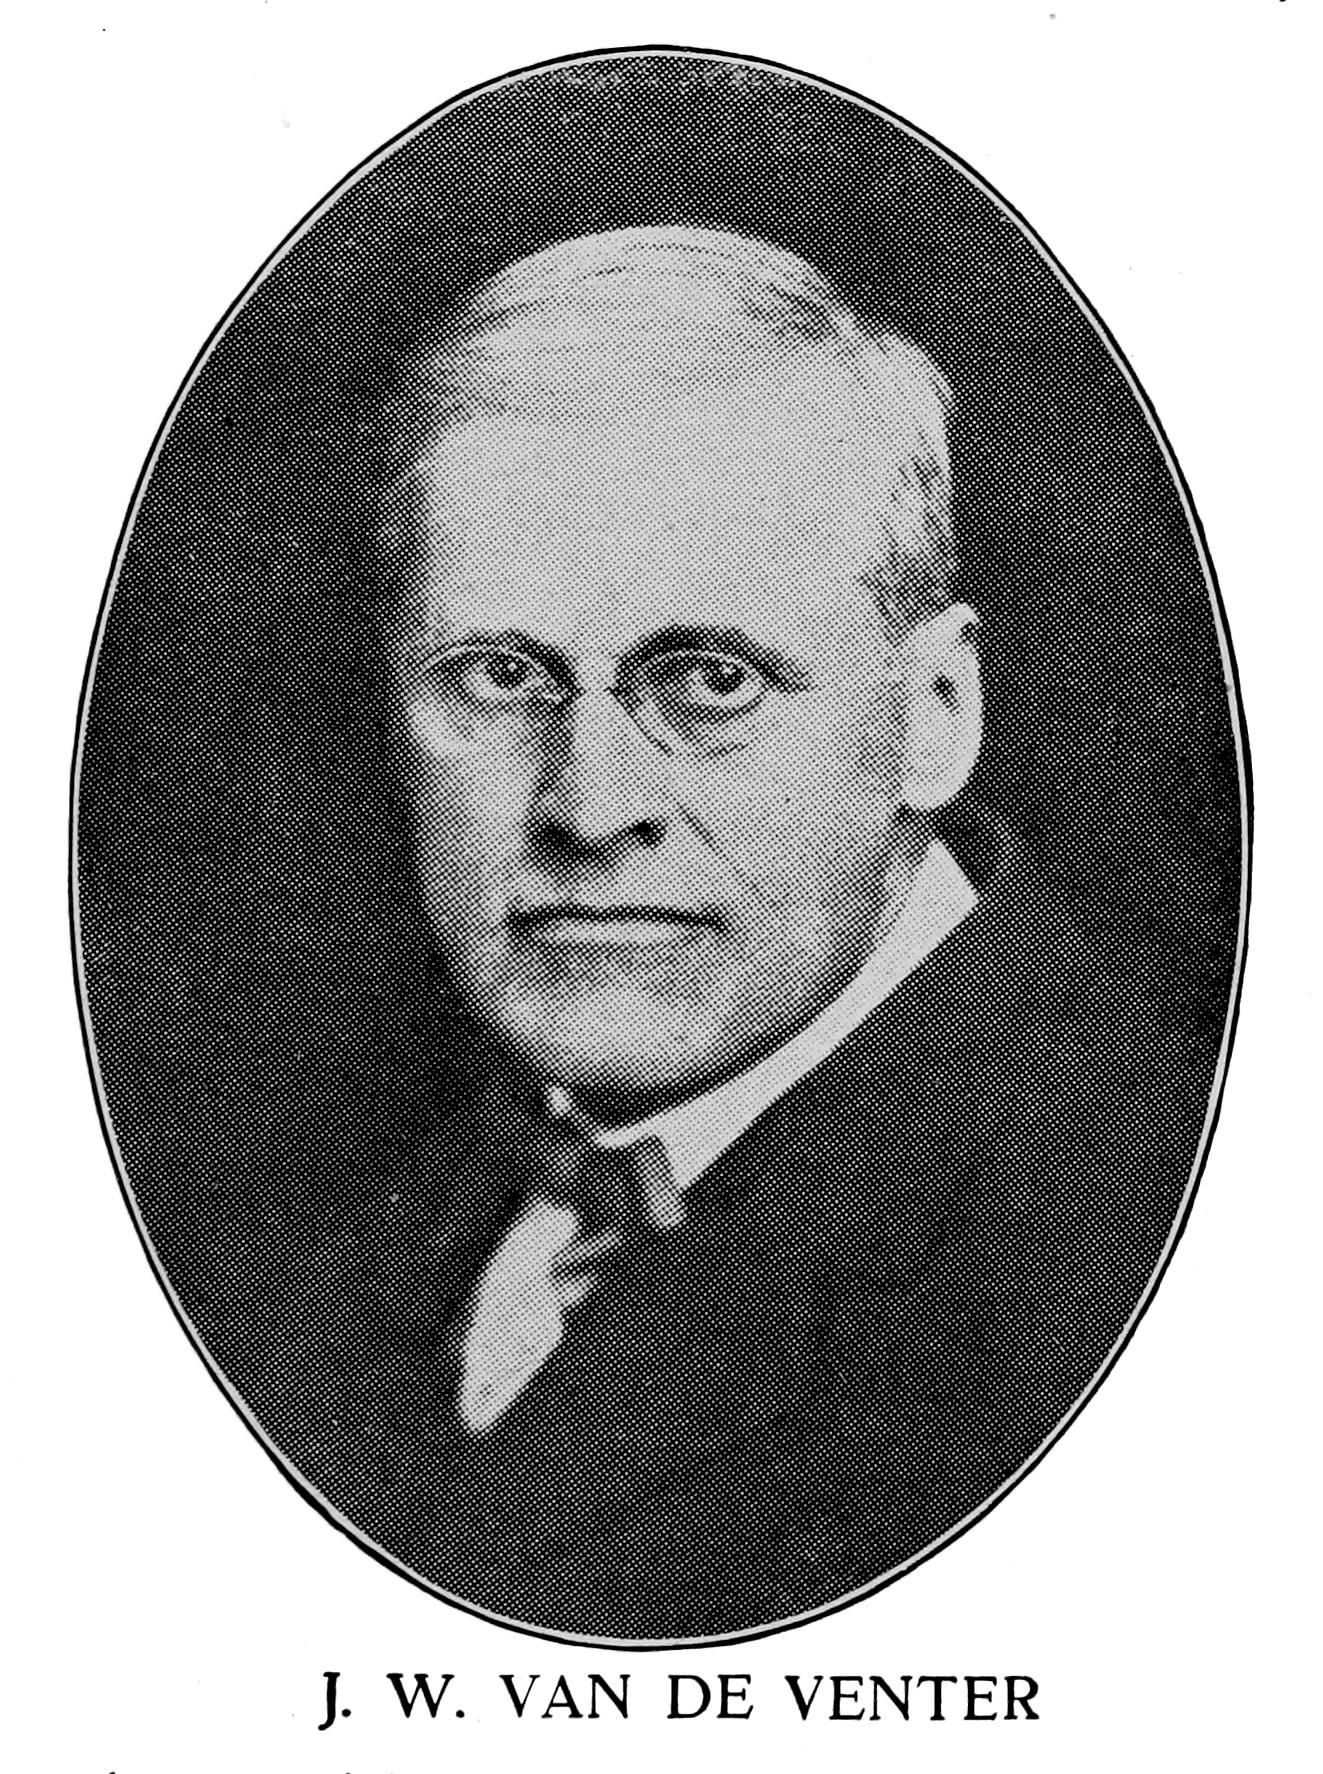 J.W. Van DeVenter , in  The Singers and Their Songs: Sketches of Living Gospel Hymn Writers  (1916), p. 29.